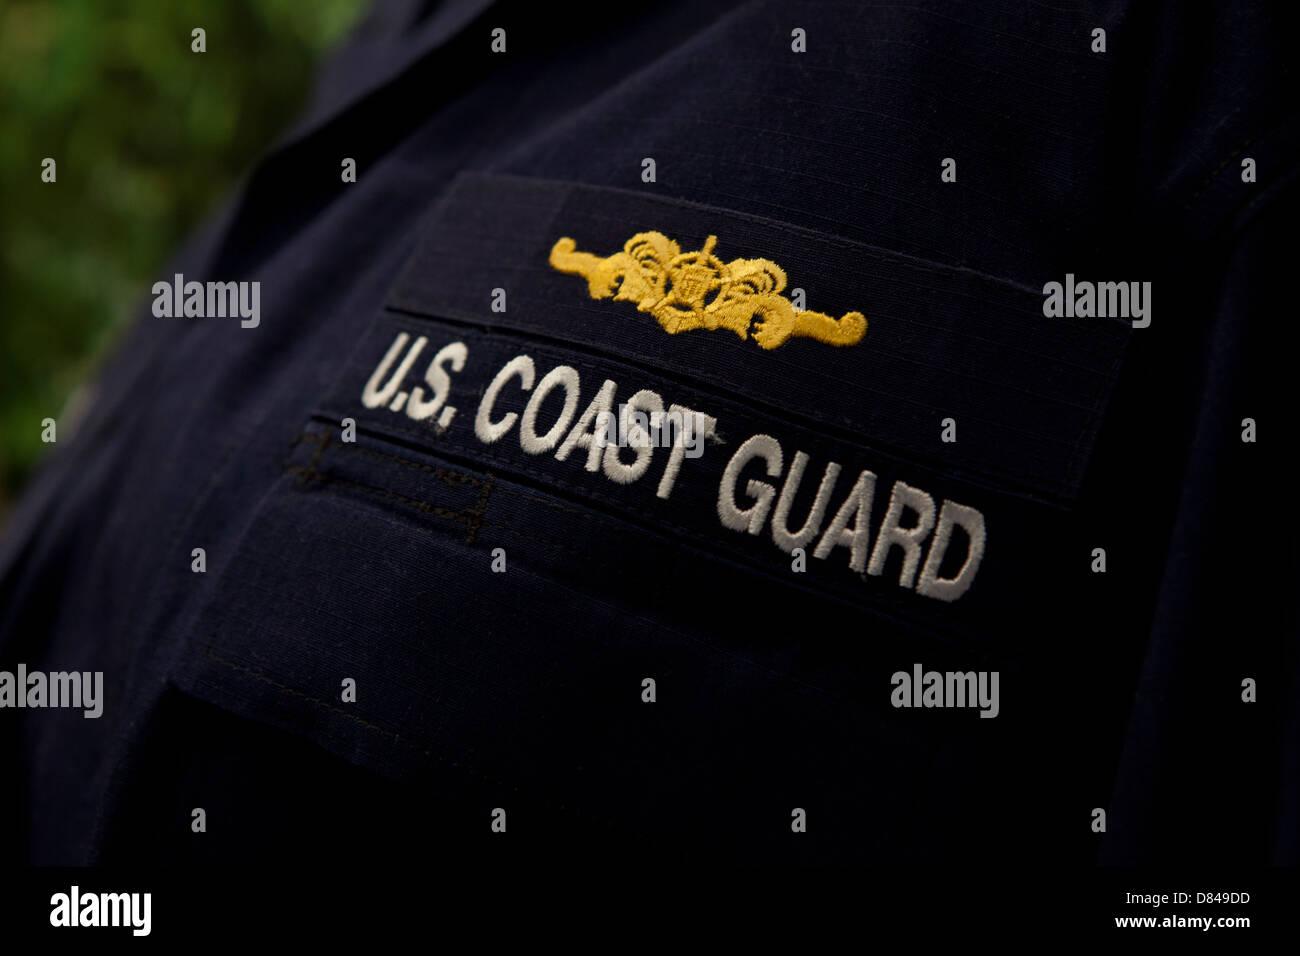 US Coast Guard combat uniform - Operation Dress Uniform - Stock Image